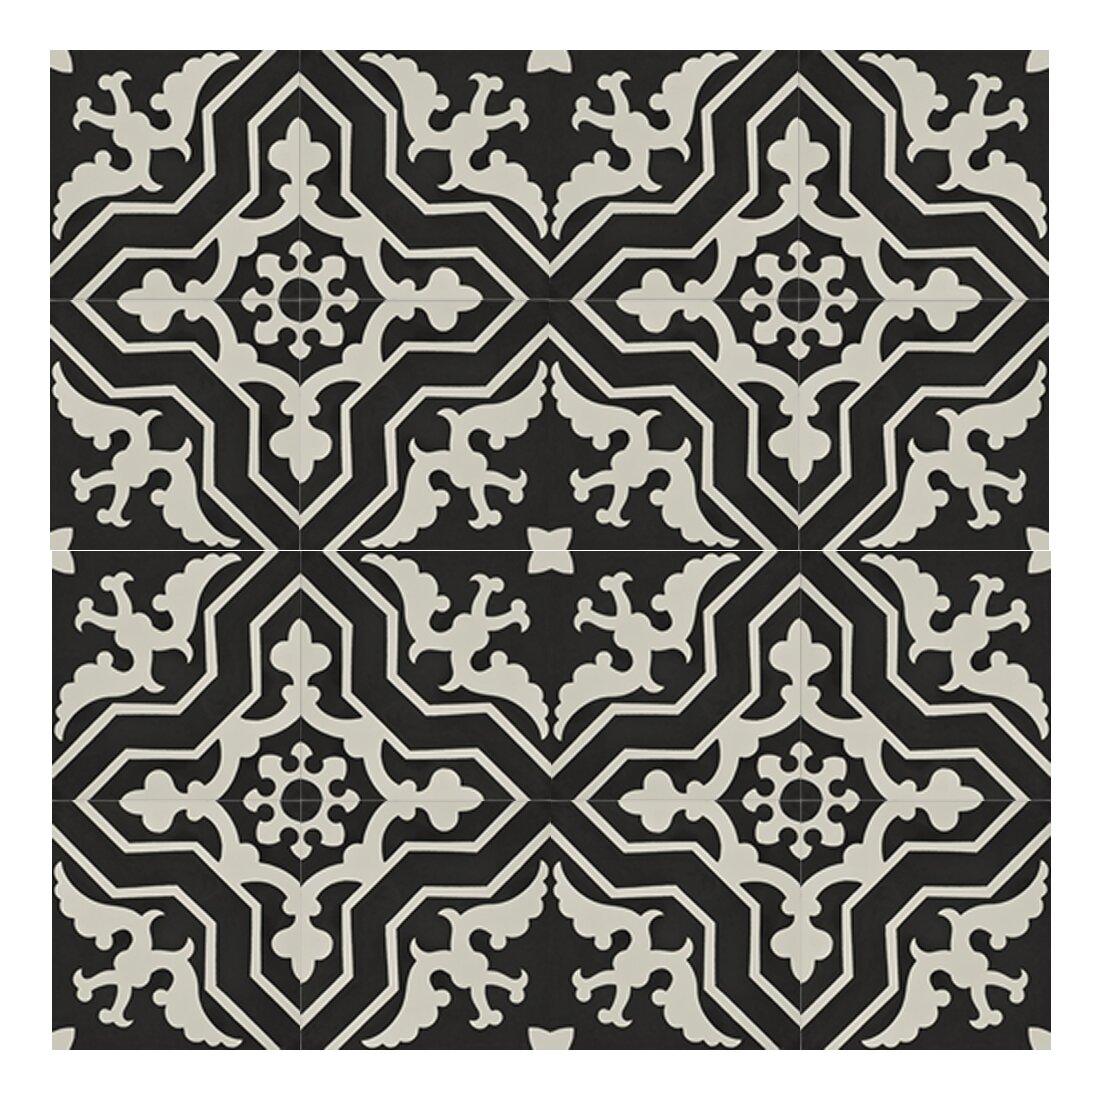 moroccan mosaic tile house temara 8 x 8 cement subway tile in black white wayfair. Black Bedroom Furniture Sets. Home Design Ideas